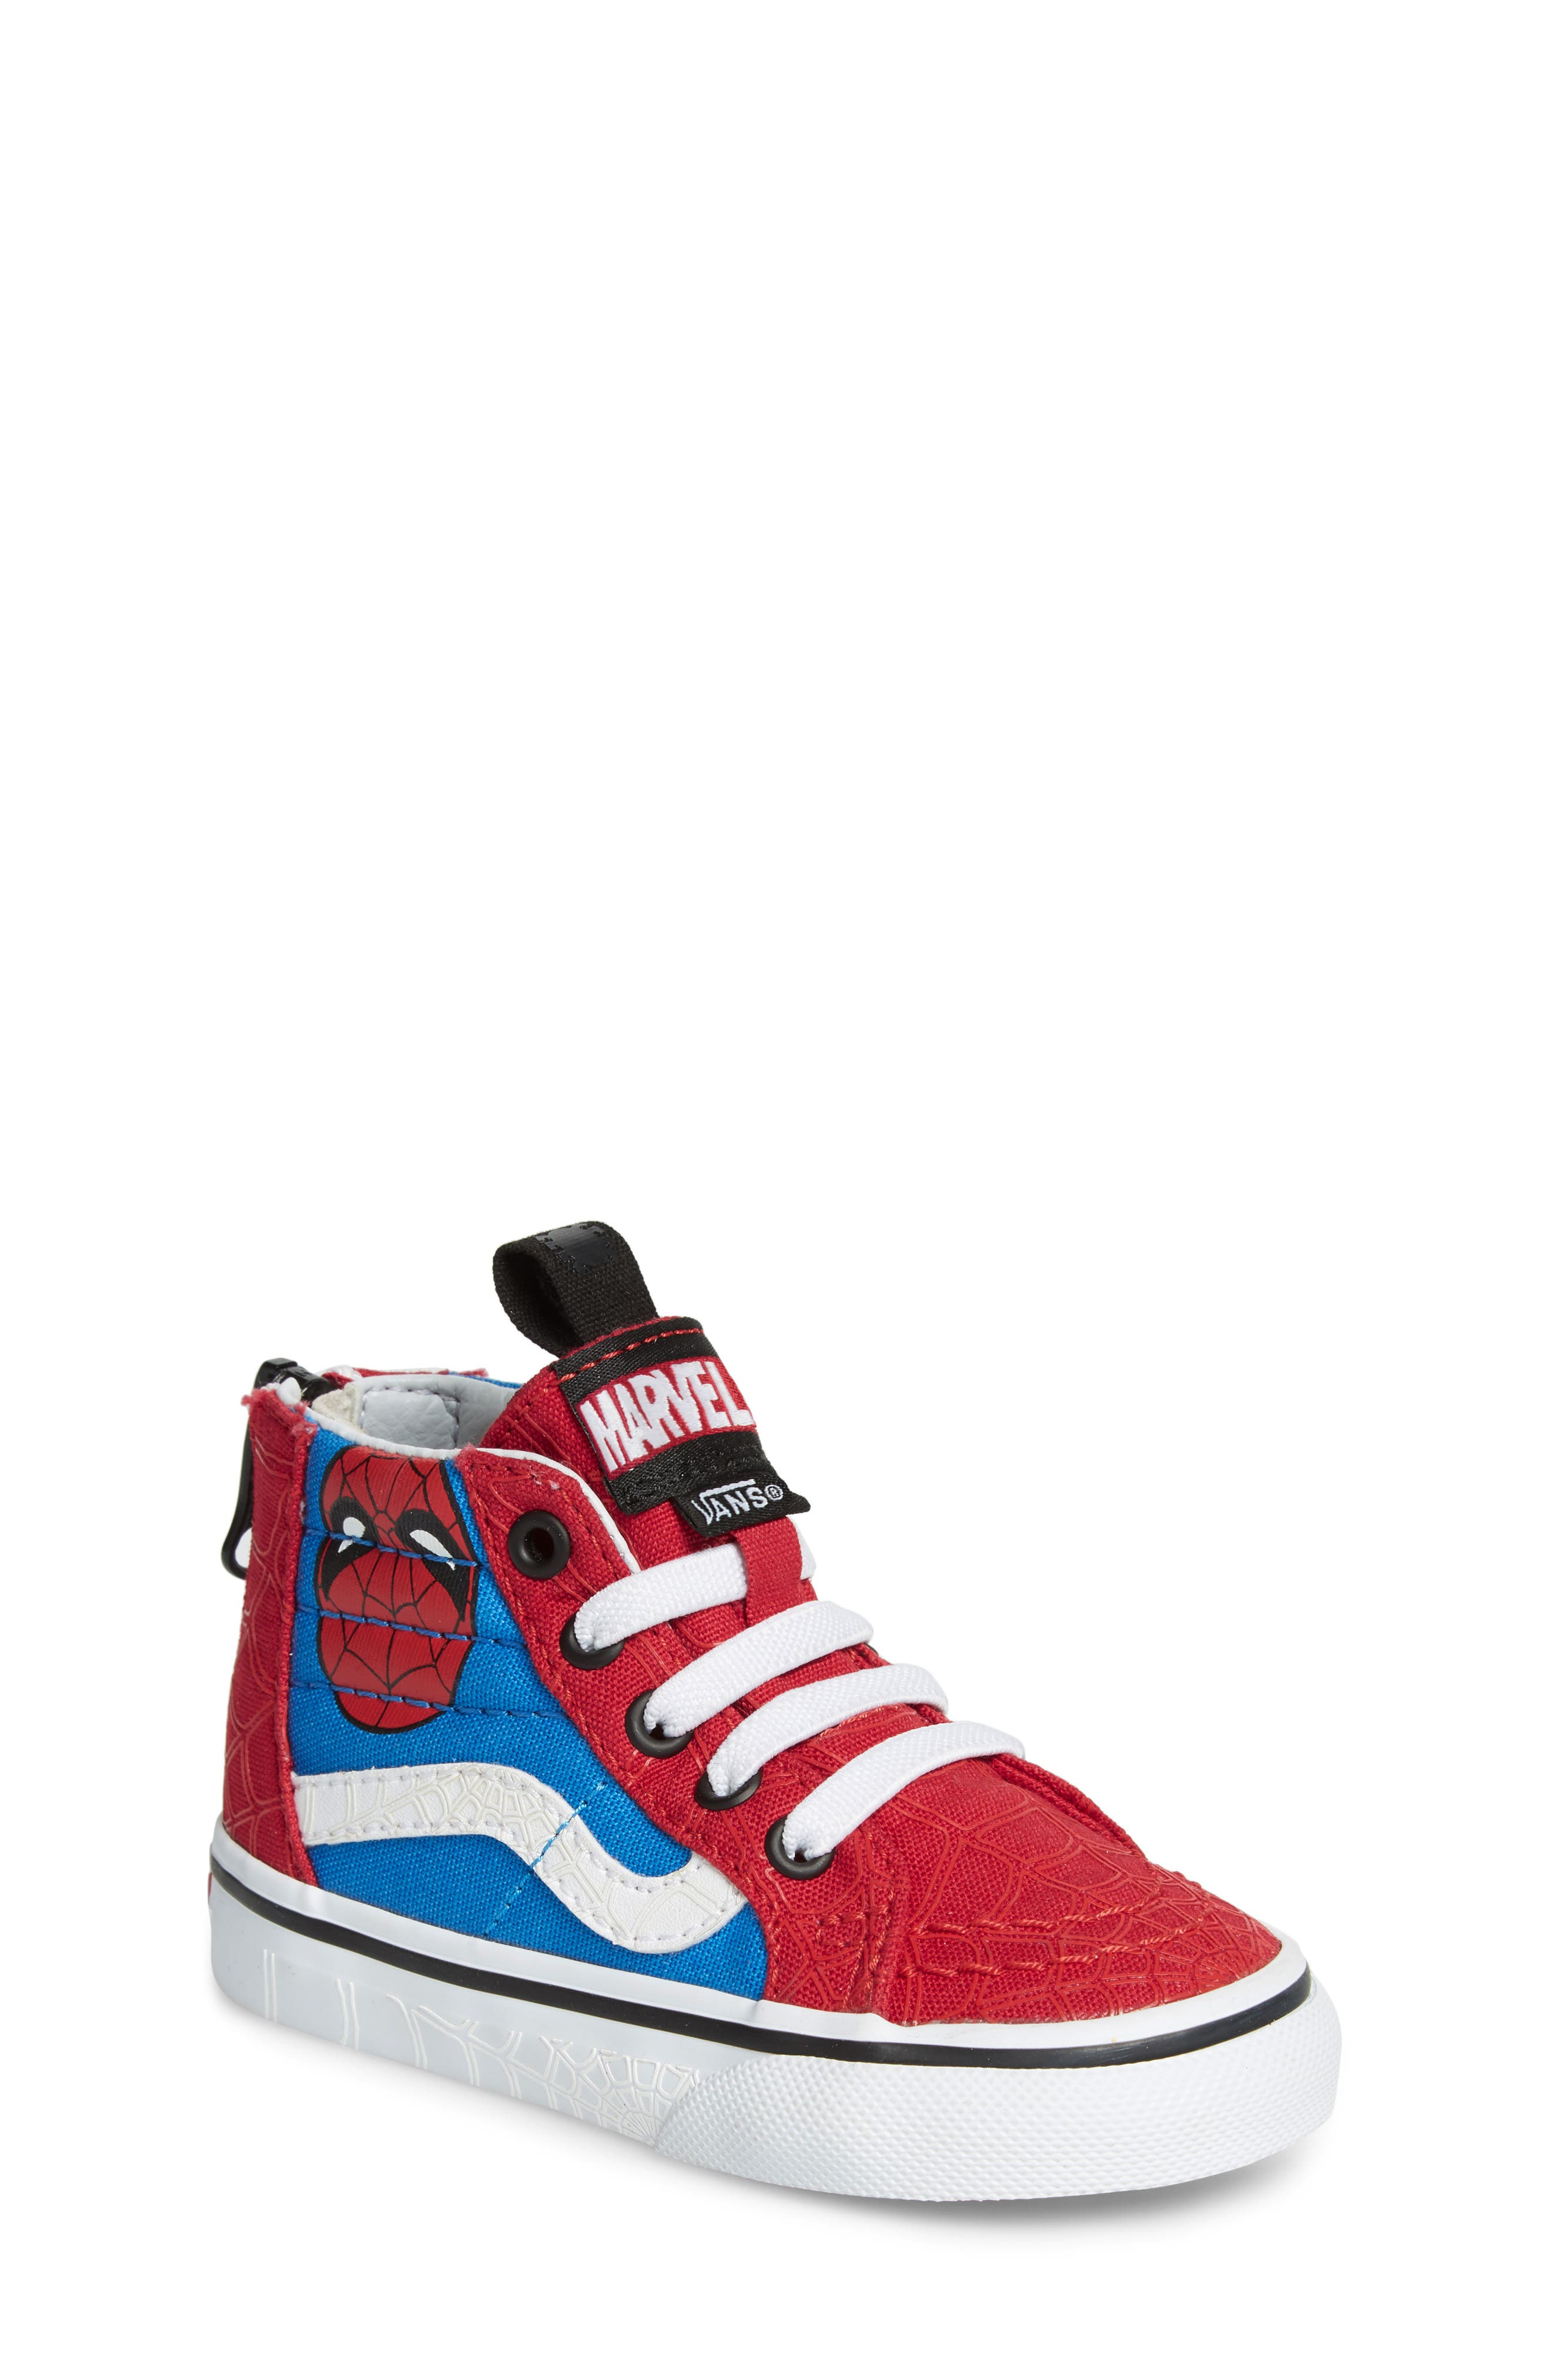 x Marvel<sup>®</sup> Spider-Man SK8-Hi Sneaker,                         Main,                         color, 610